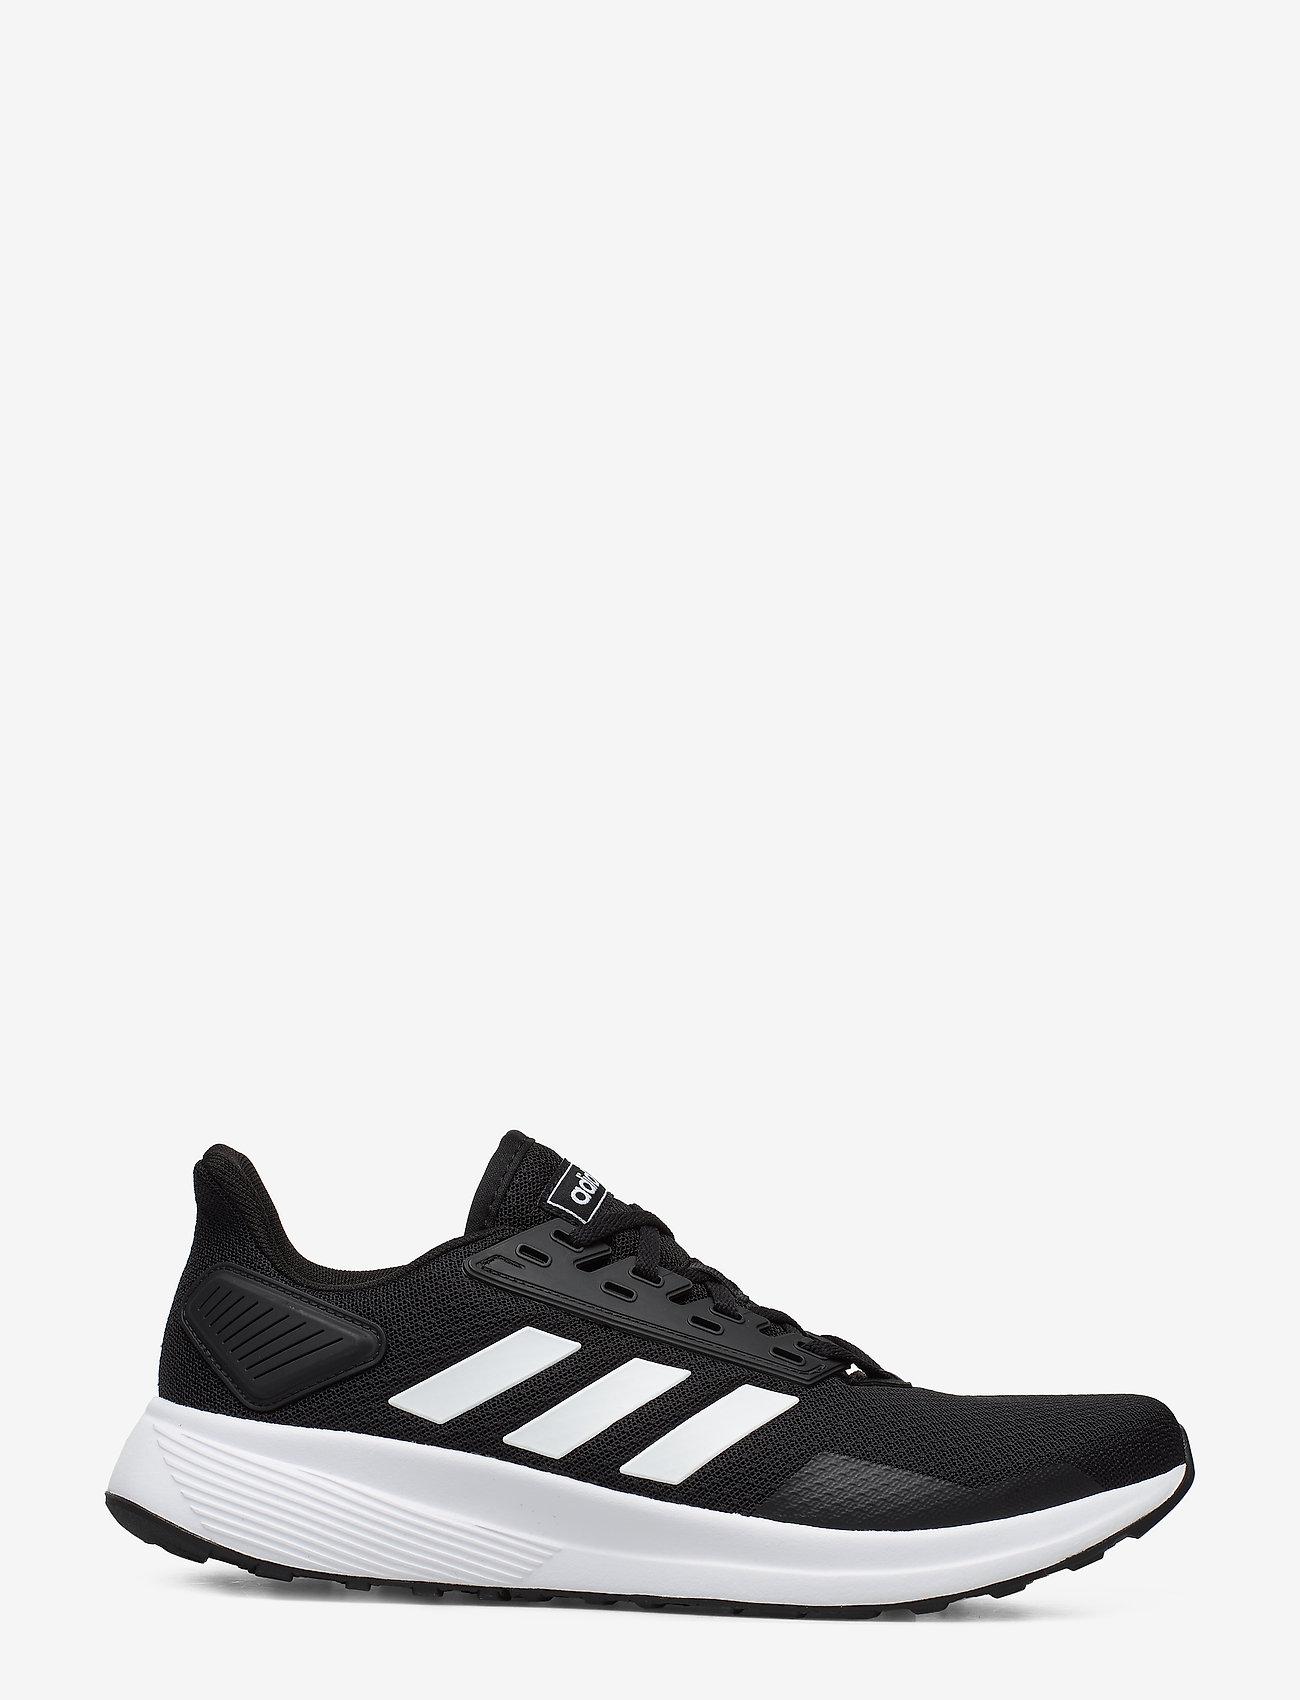 Adidas Performance Duramo 9 - Sport Shoes